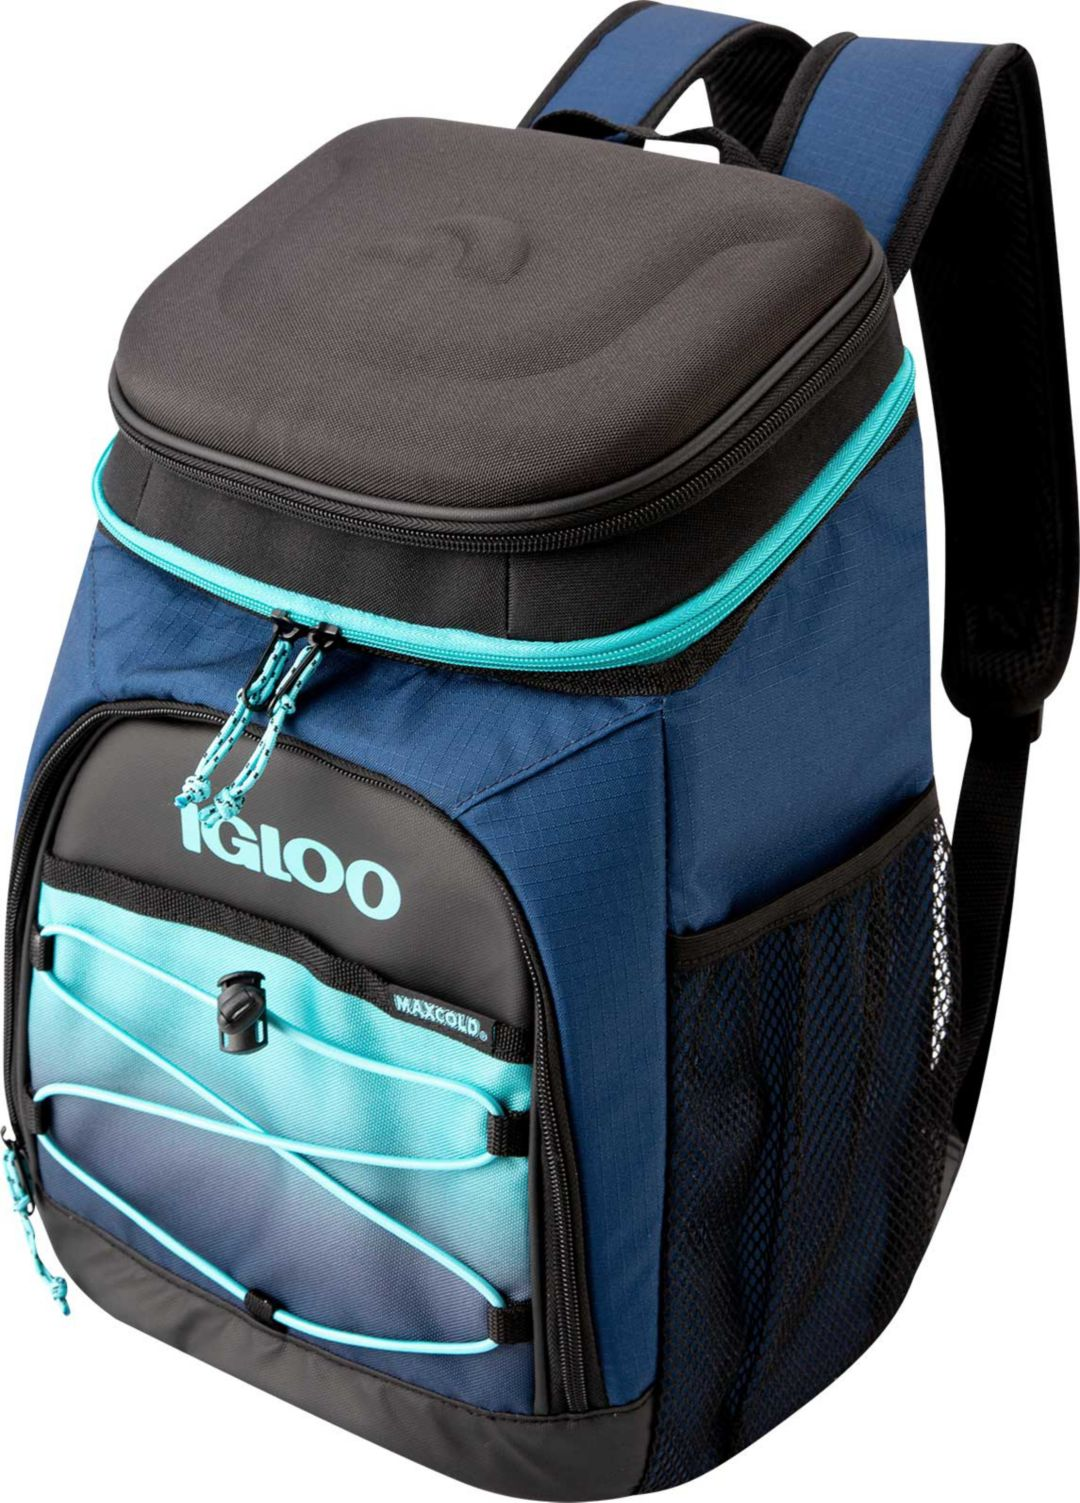 Igloo Ringleader Hard Top Backpack Cooler